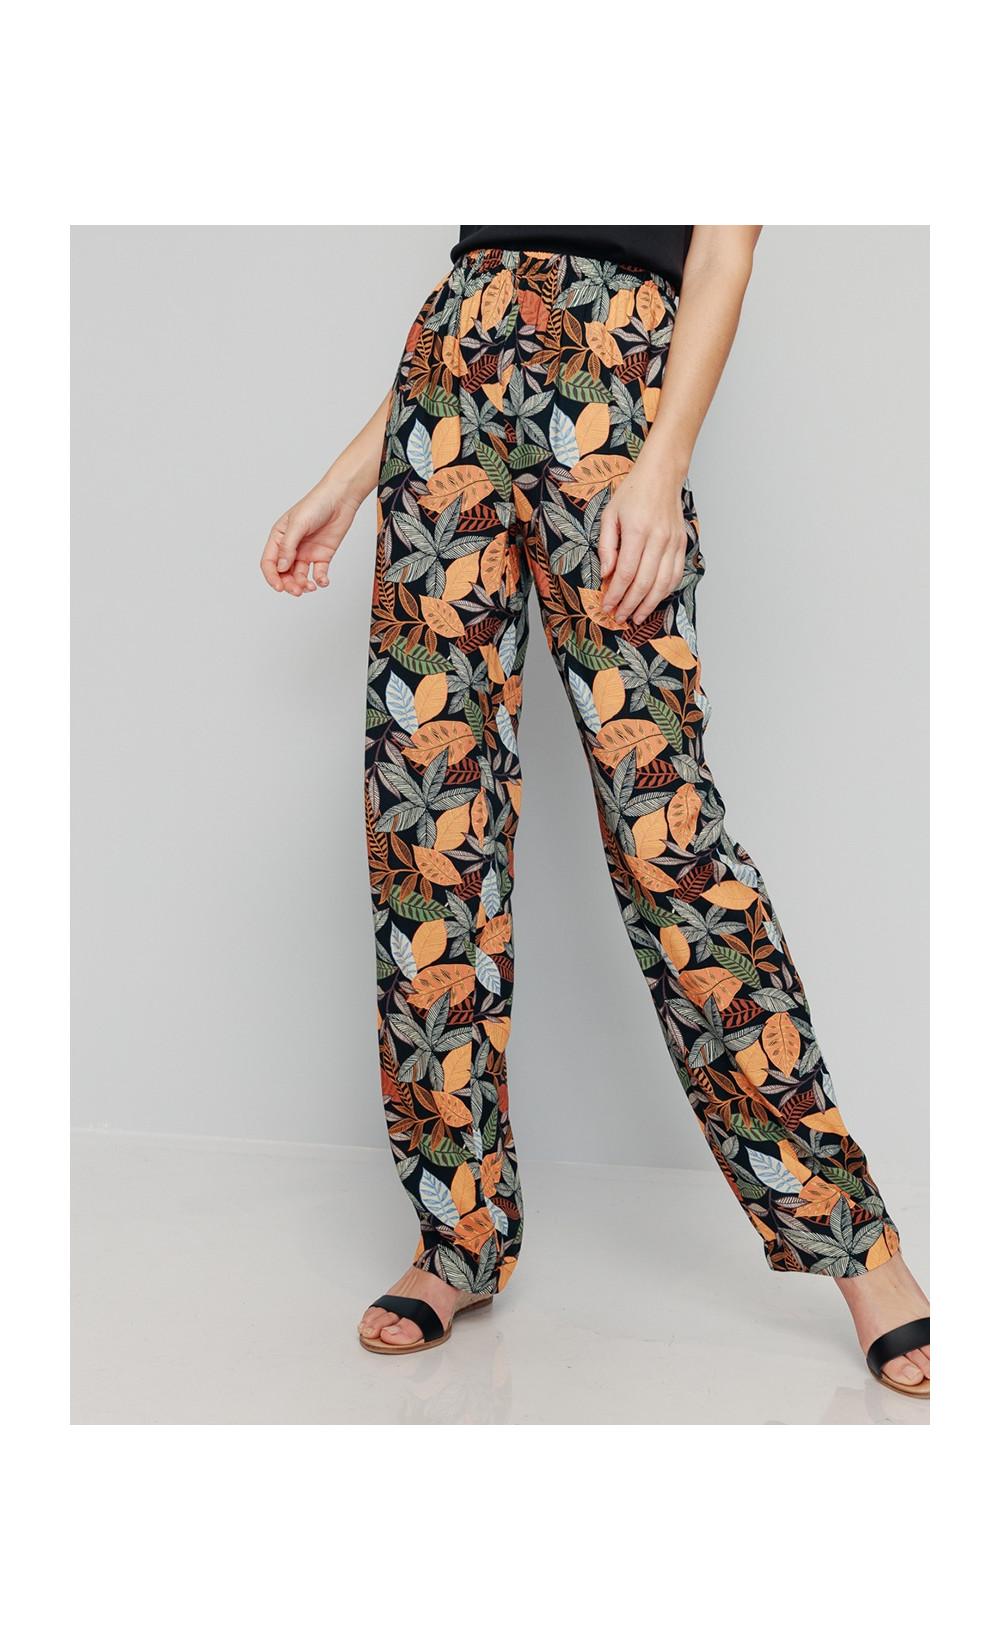 pantalon - NOUVEAU